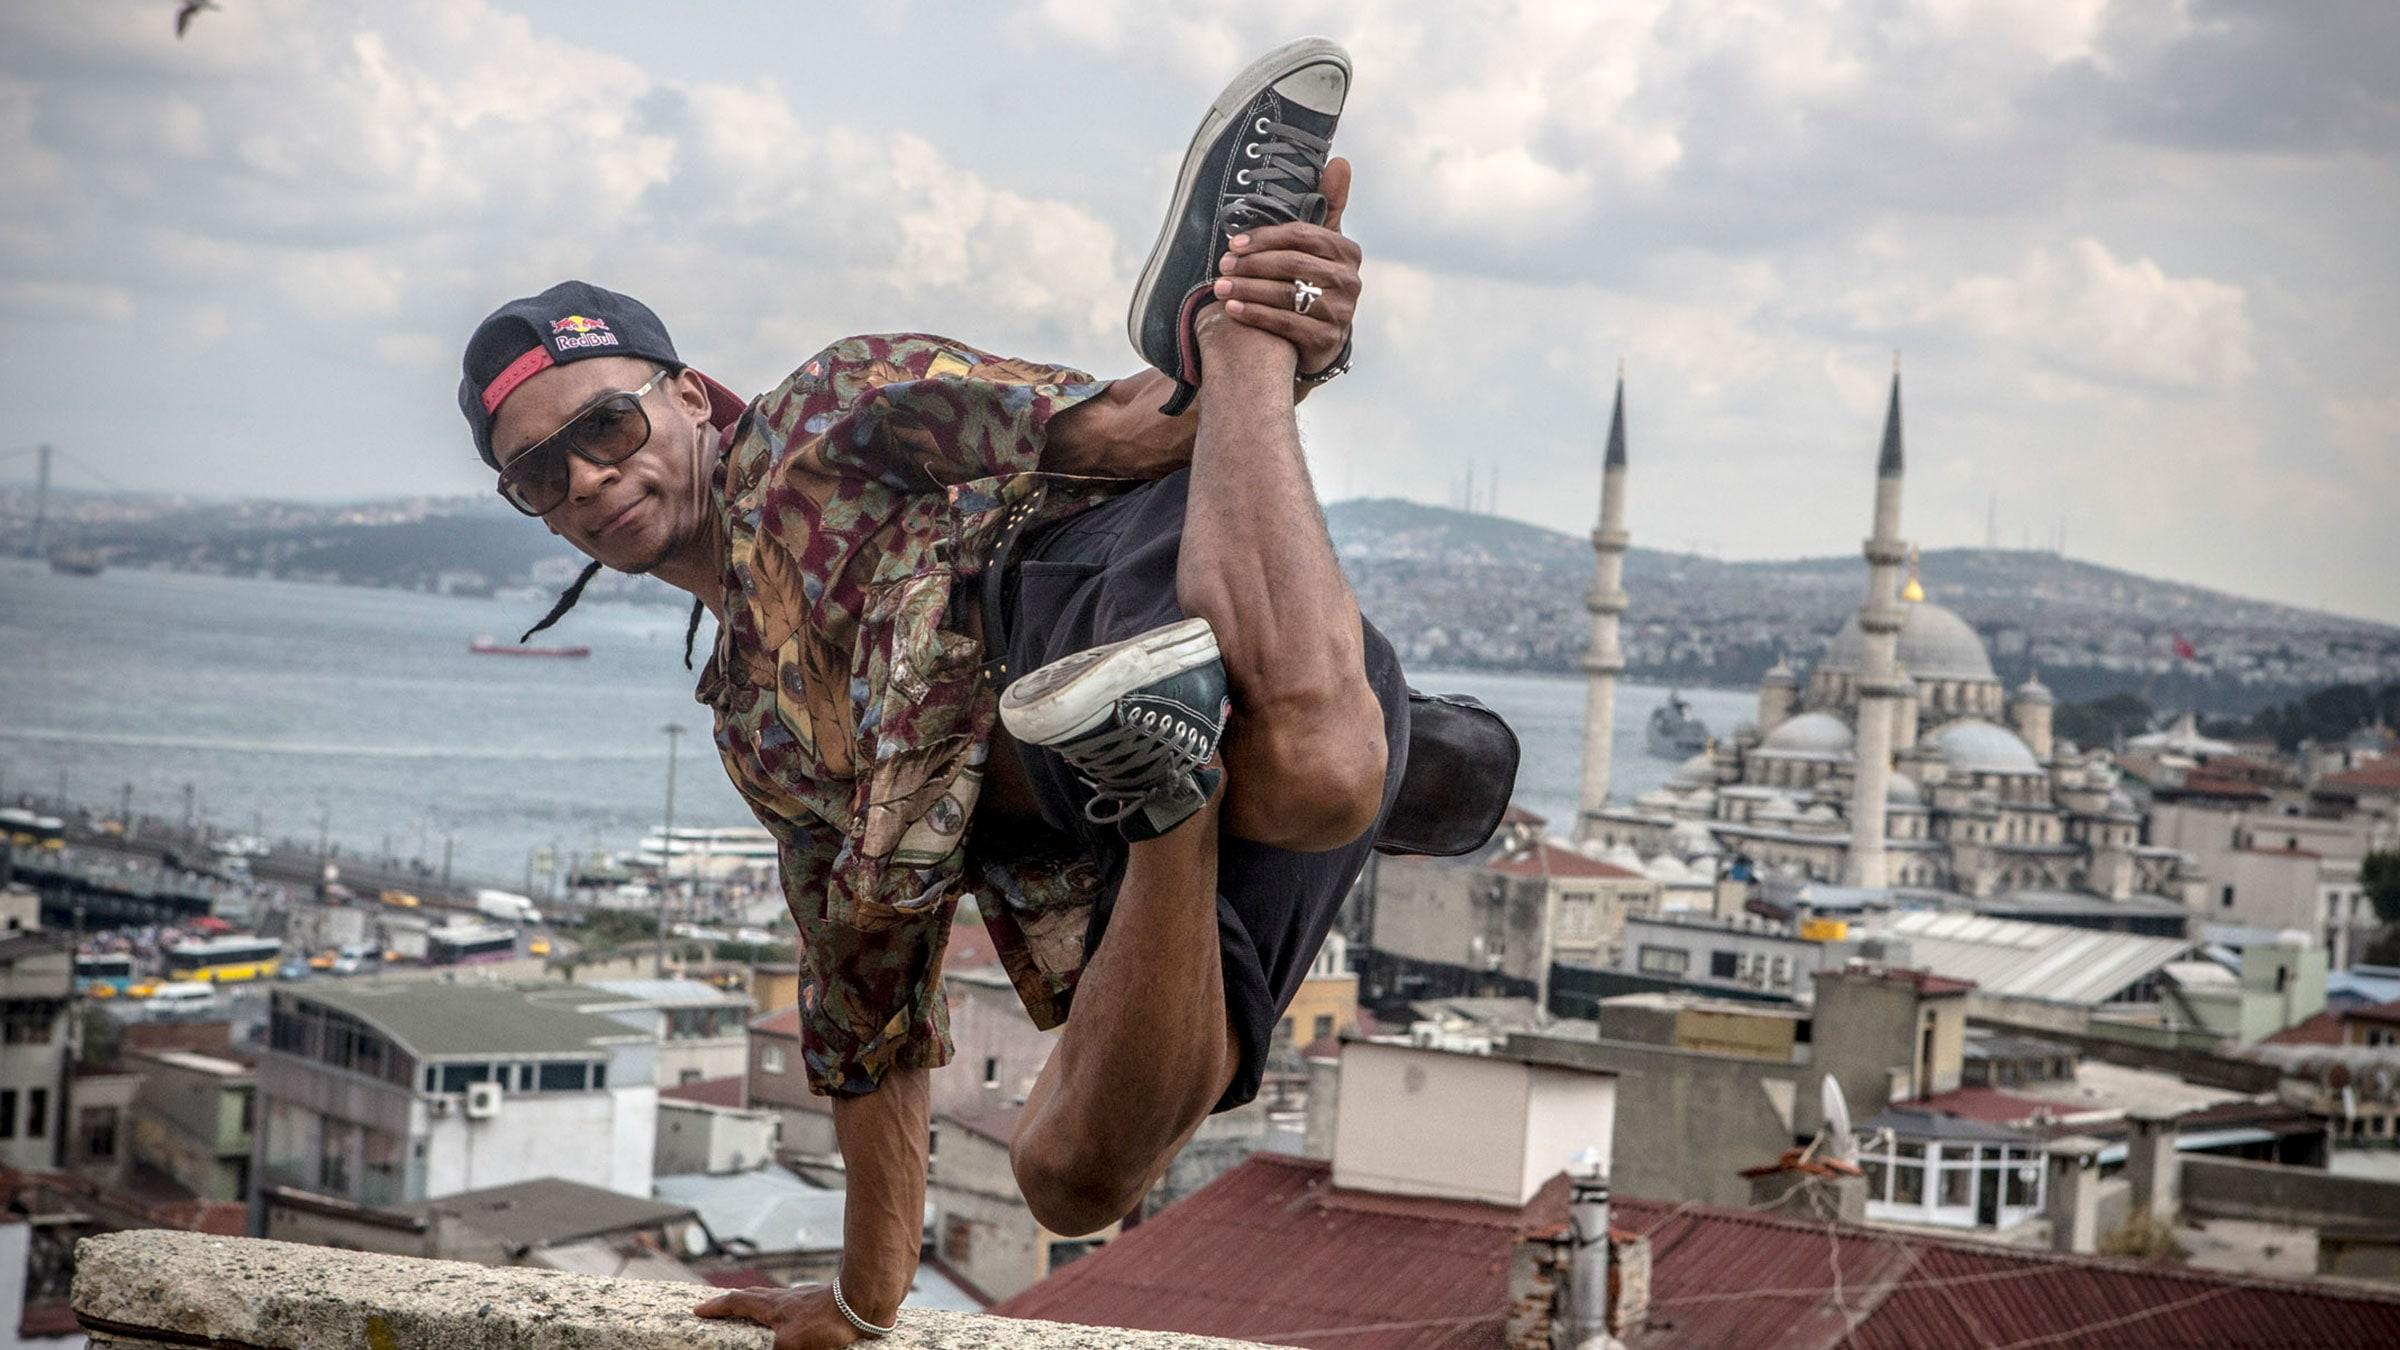 Red Bull Anadolu Break